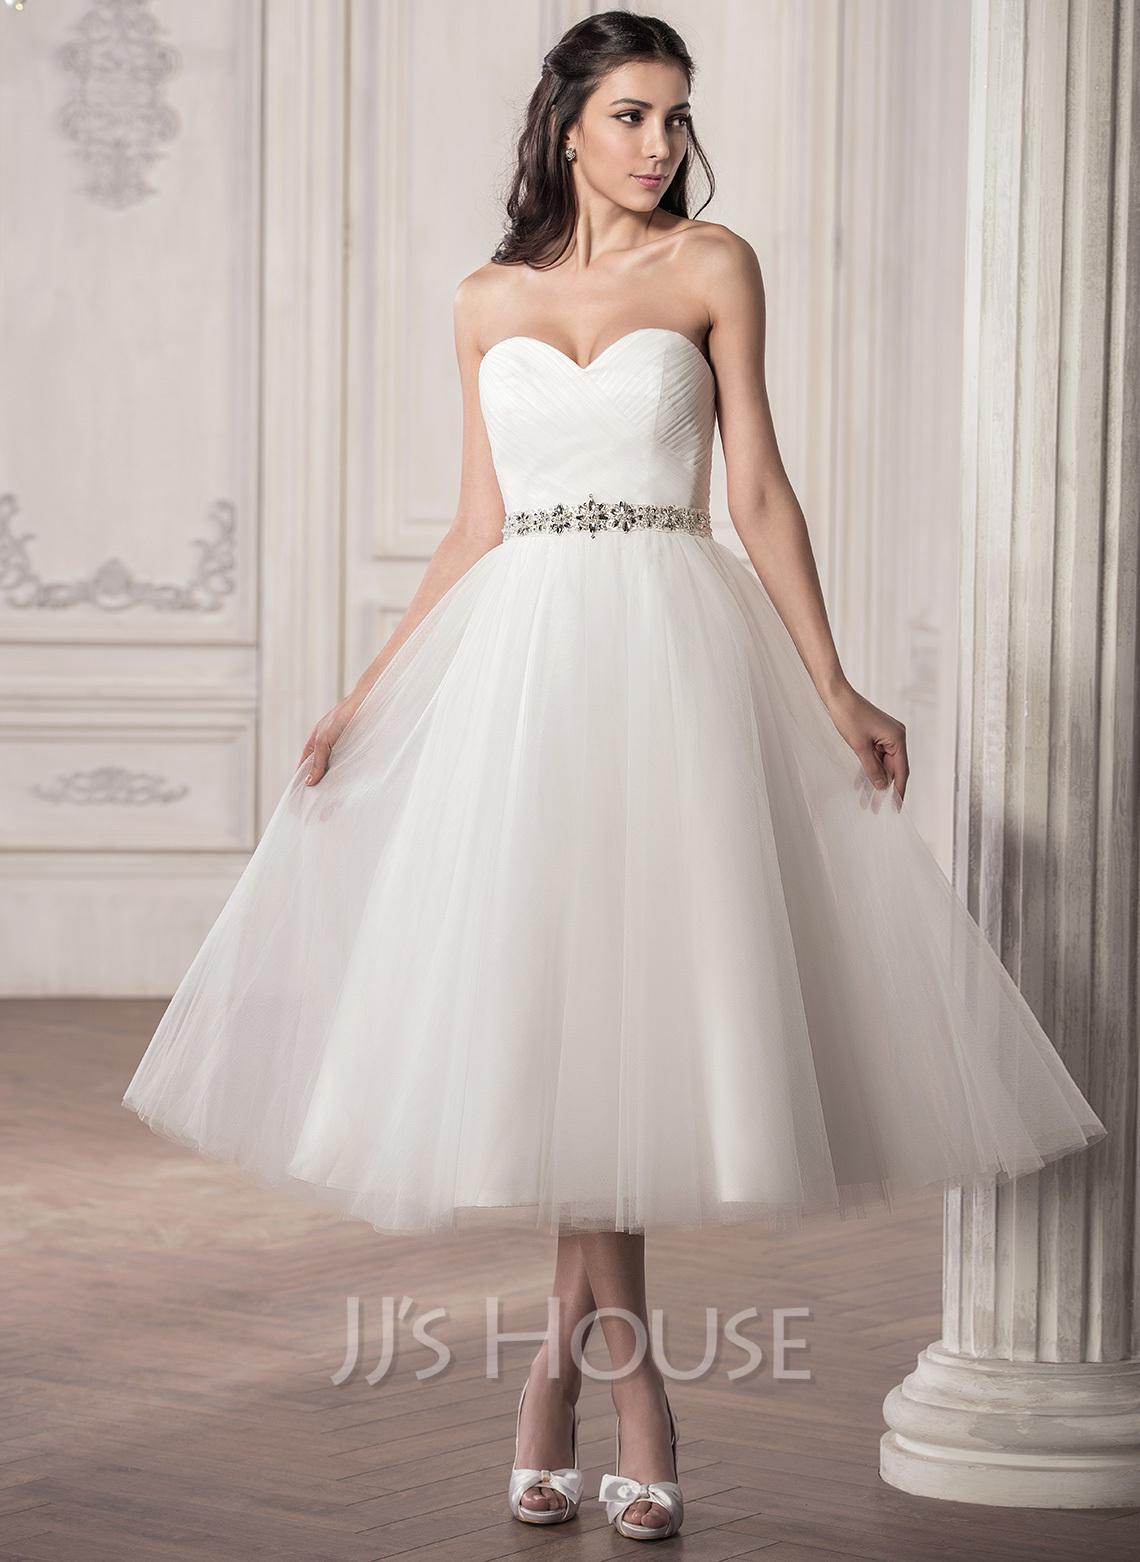 A-Line/Princess Sweetheart Tea-Length Tulle Wedding Dress With Ruffle Beading Sequins